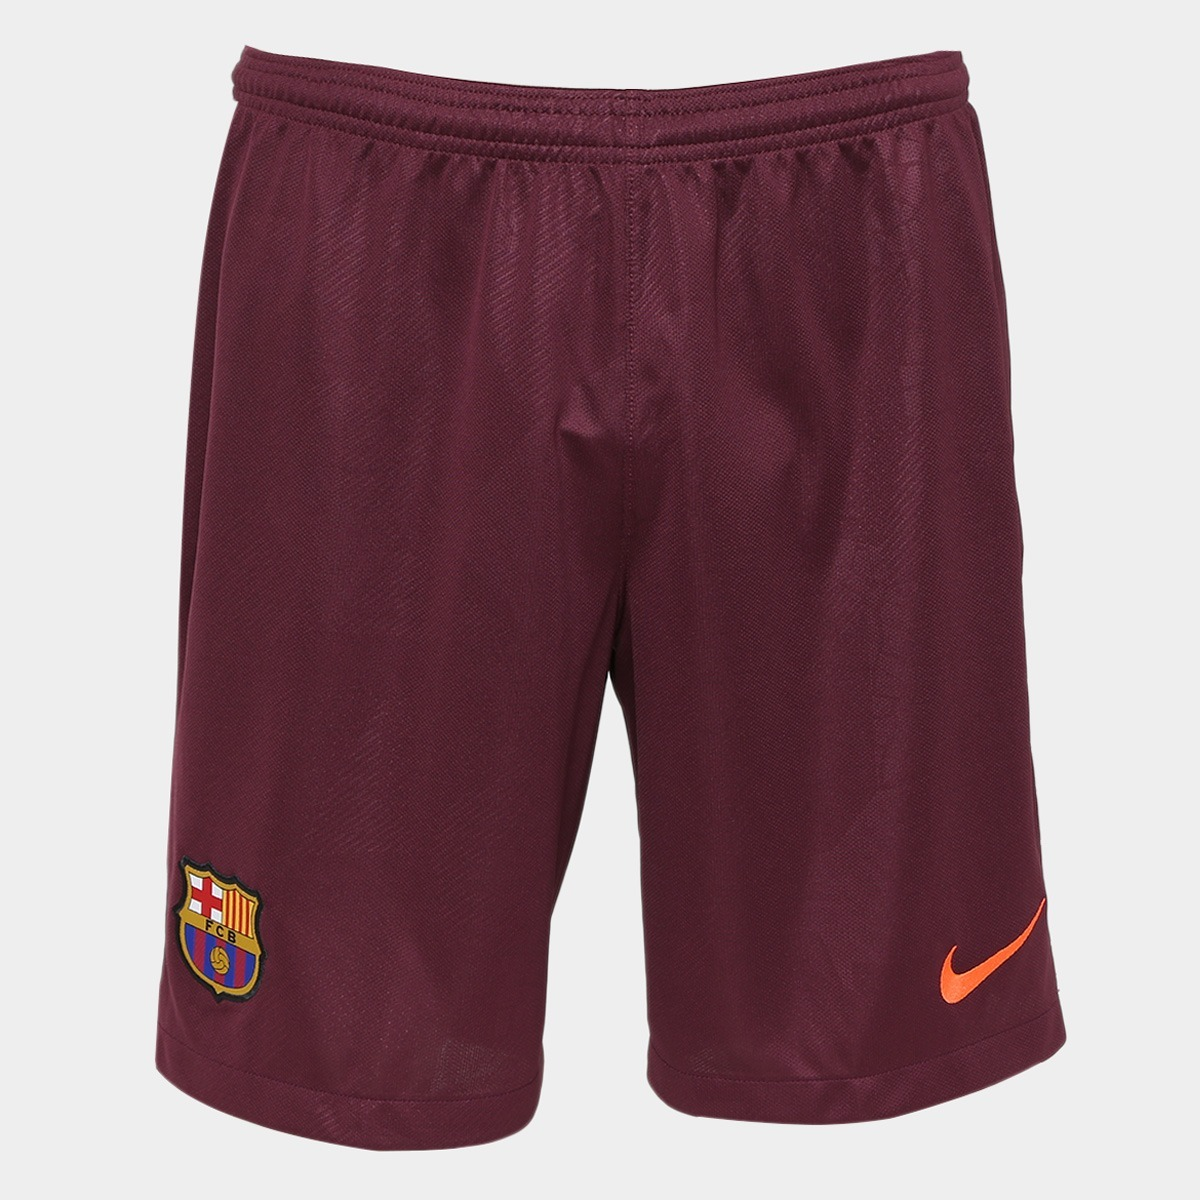 uniforme infanti camisa e shorts barcelona 2018 oficial nike. Carregando  zoom. 8cebdef2313